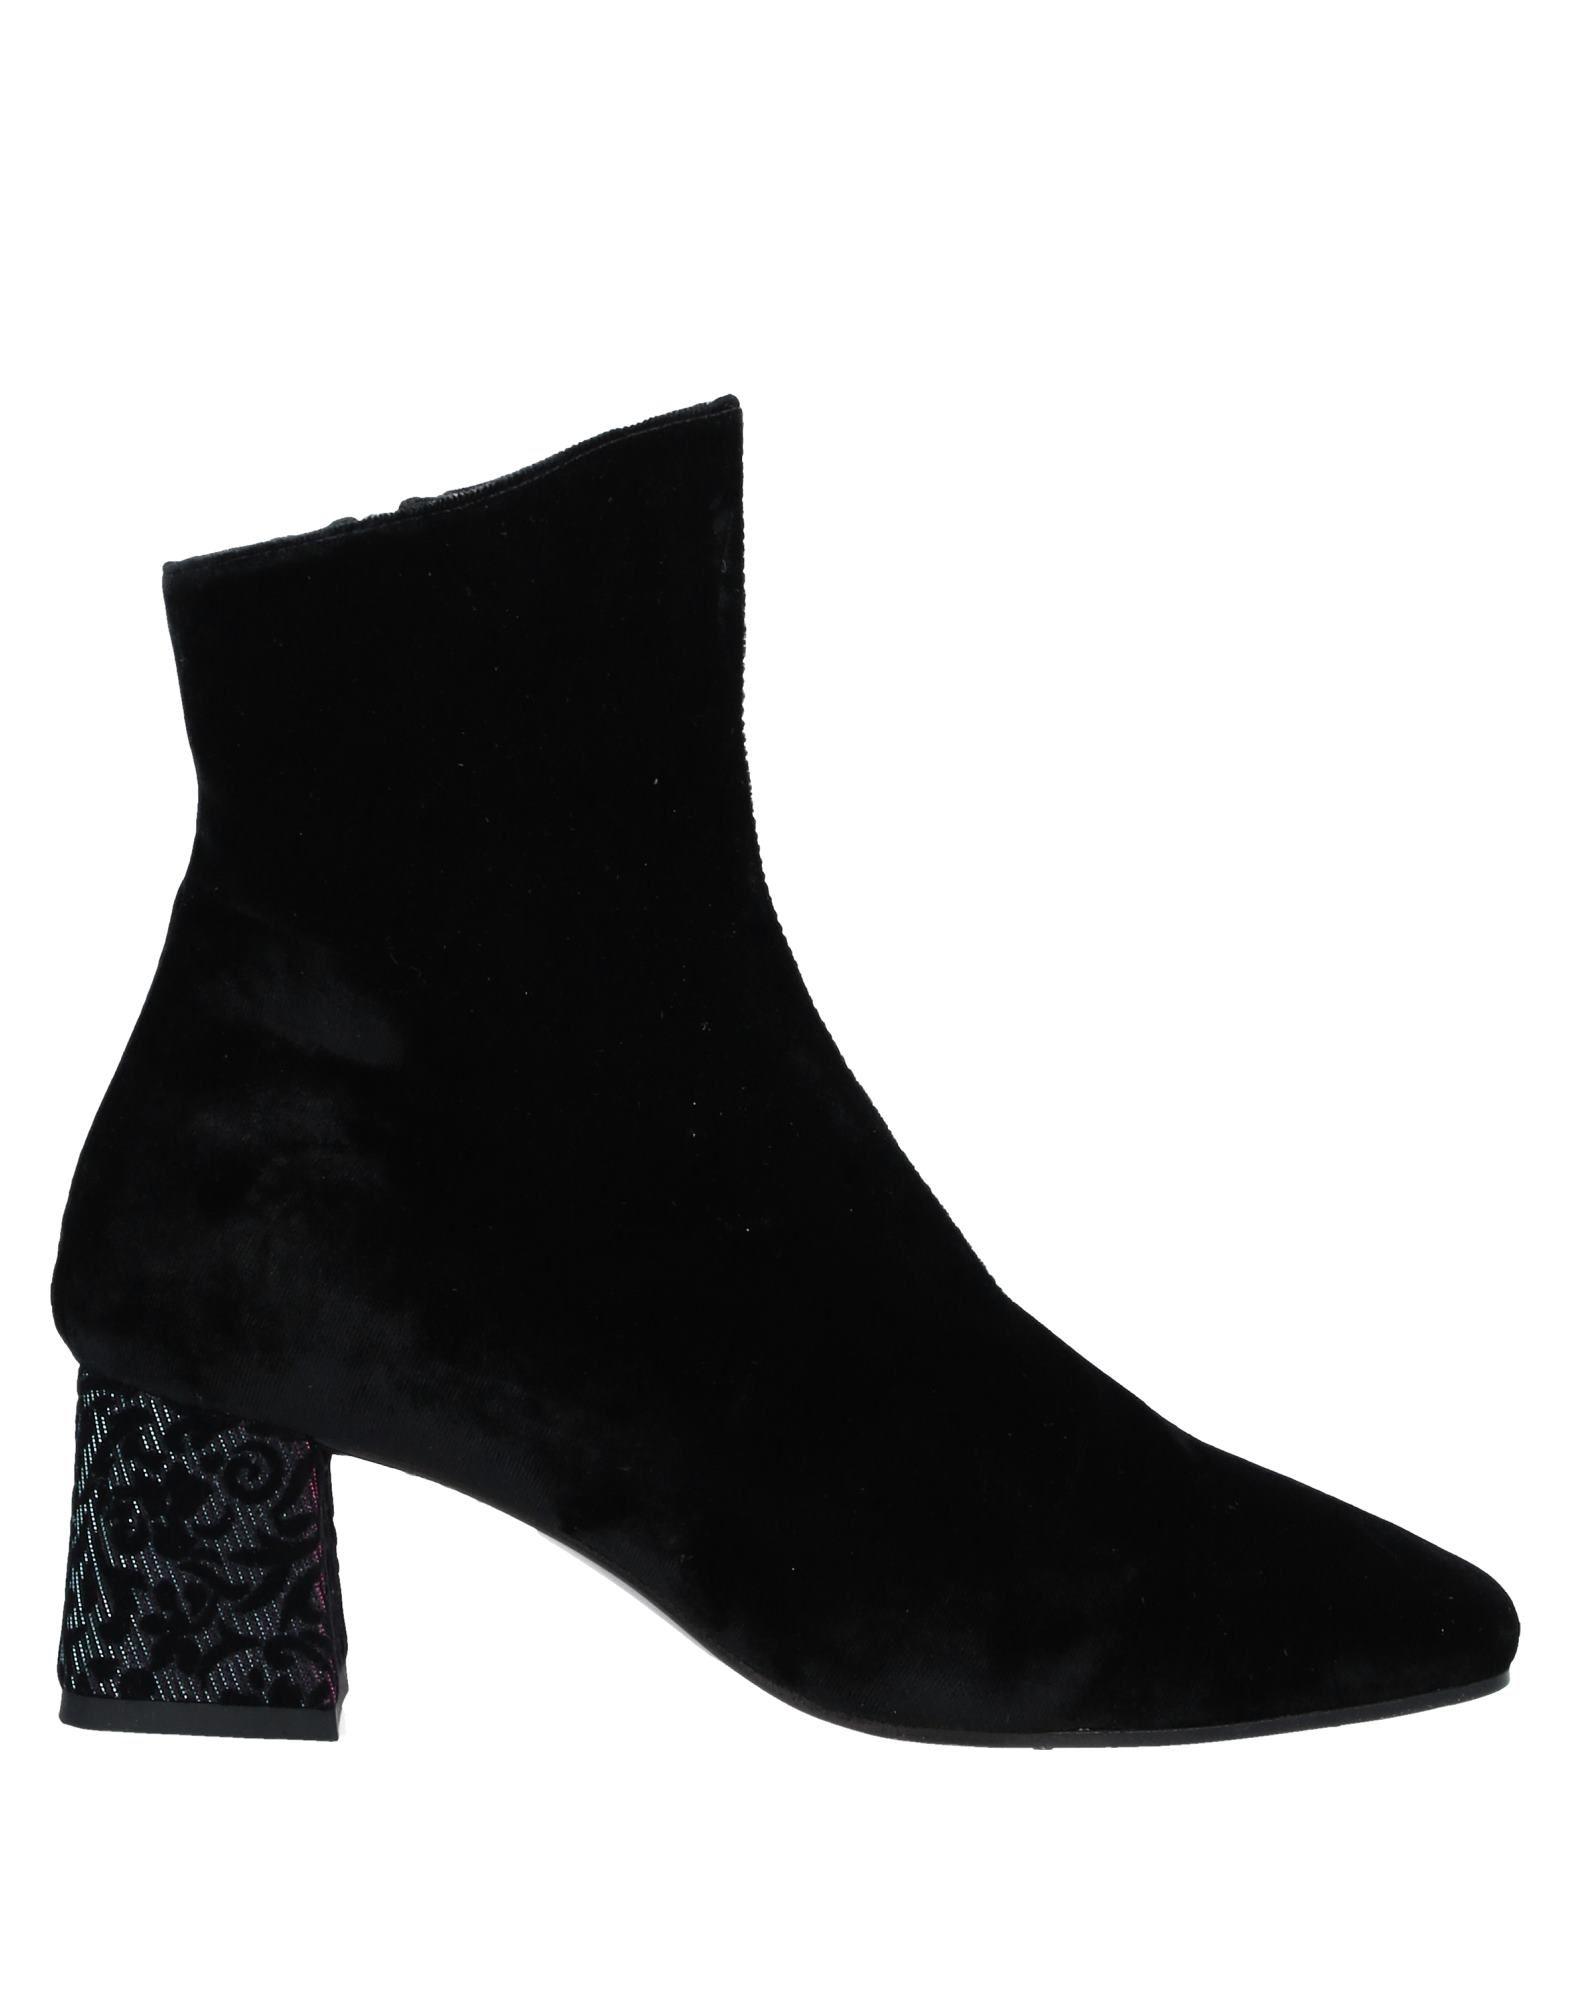 mina buenos aires сандалии MINA BUENOS AIRES Полусапоги и высокие ботинки